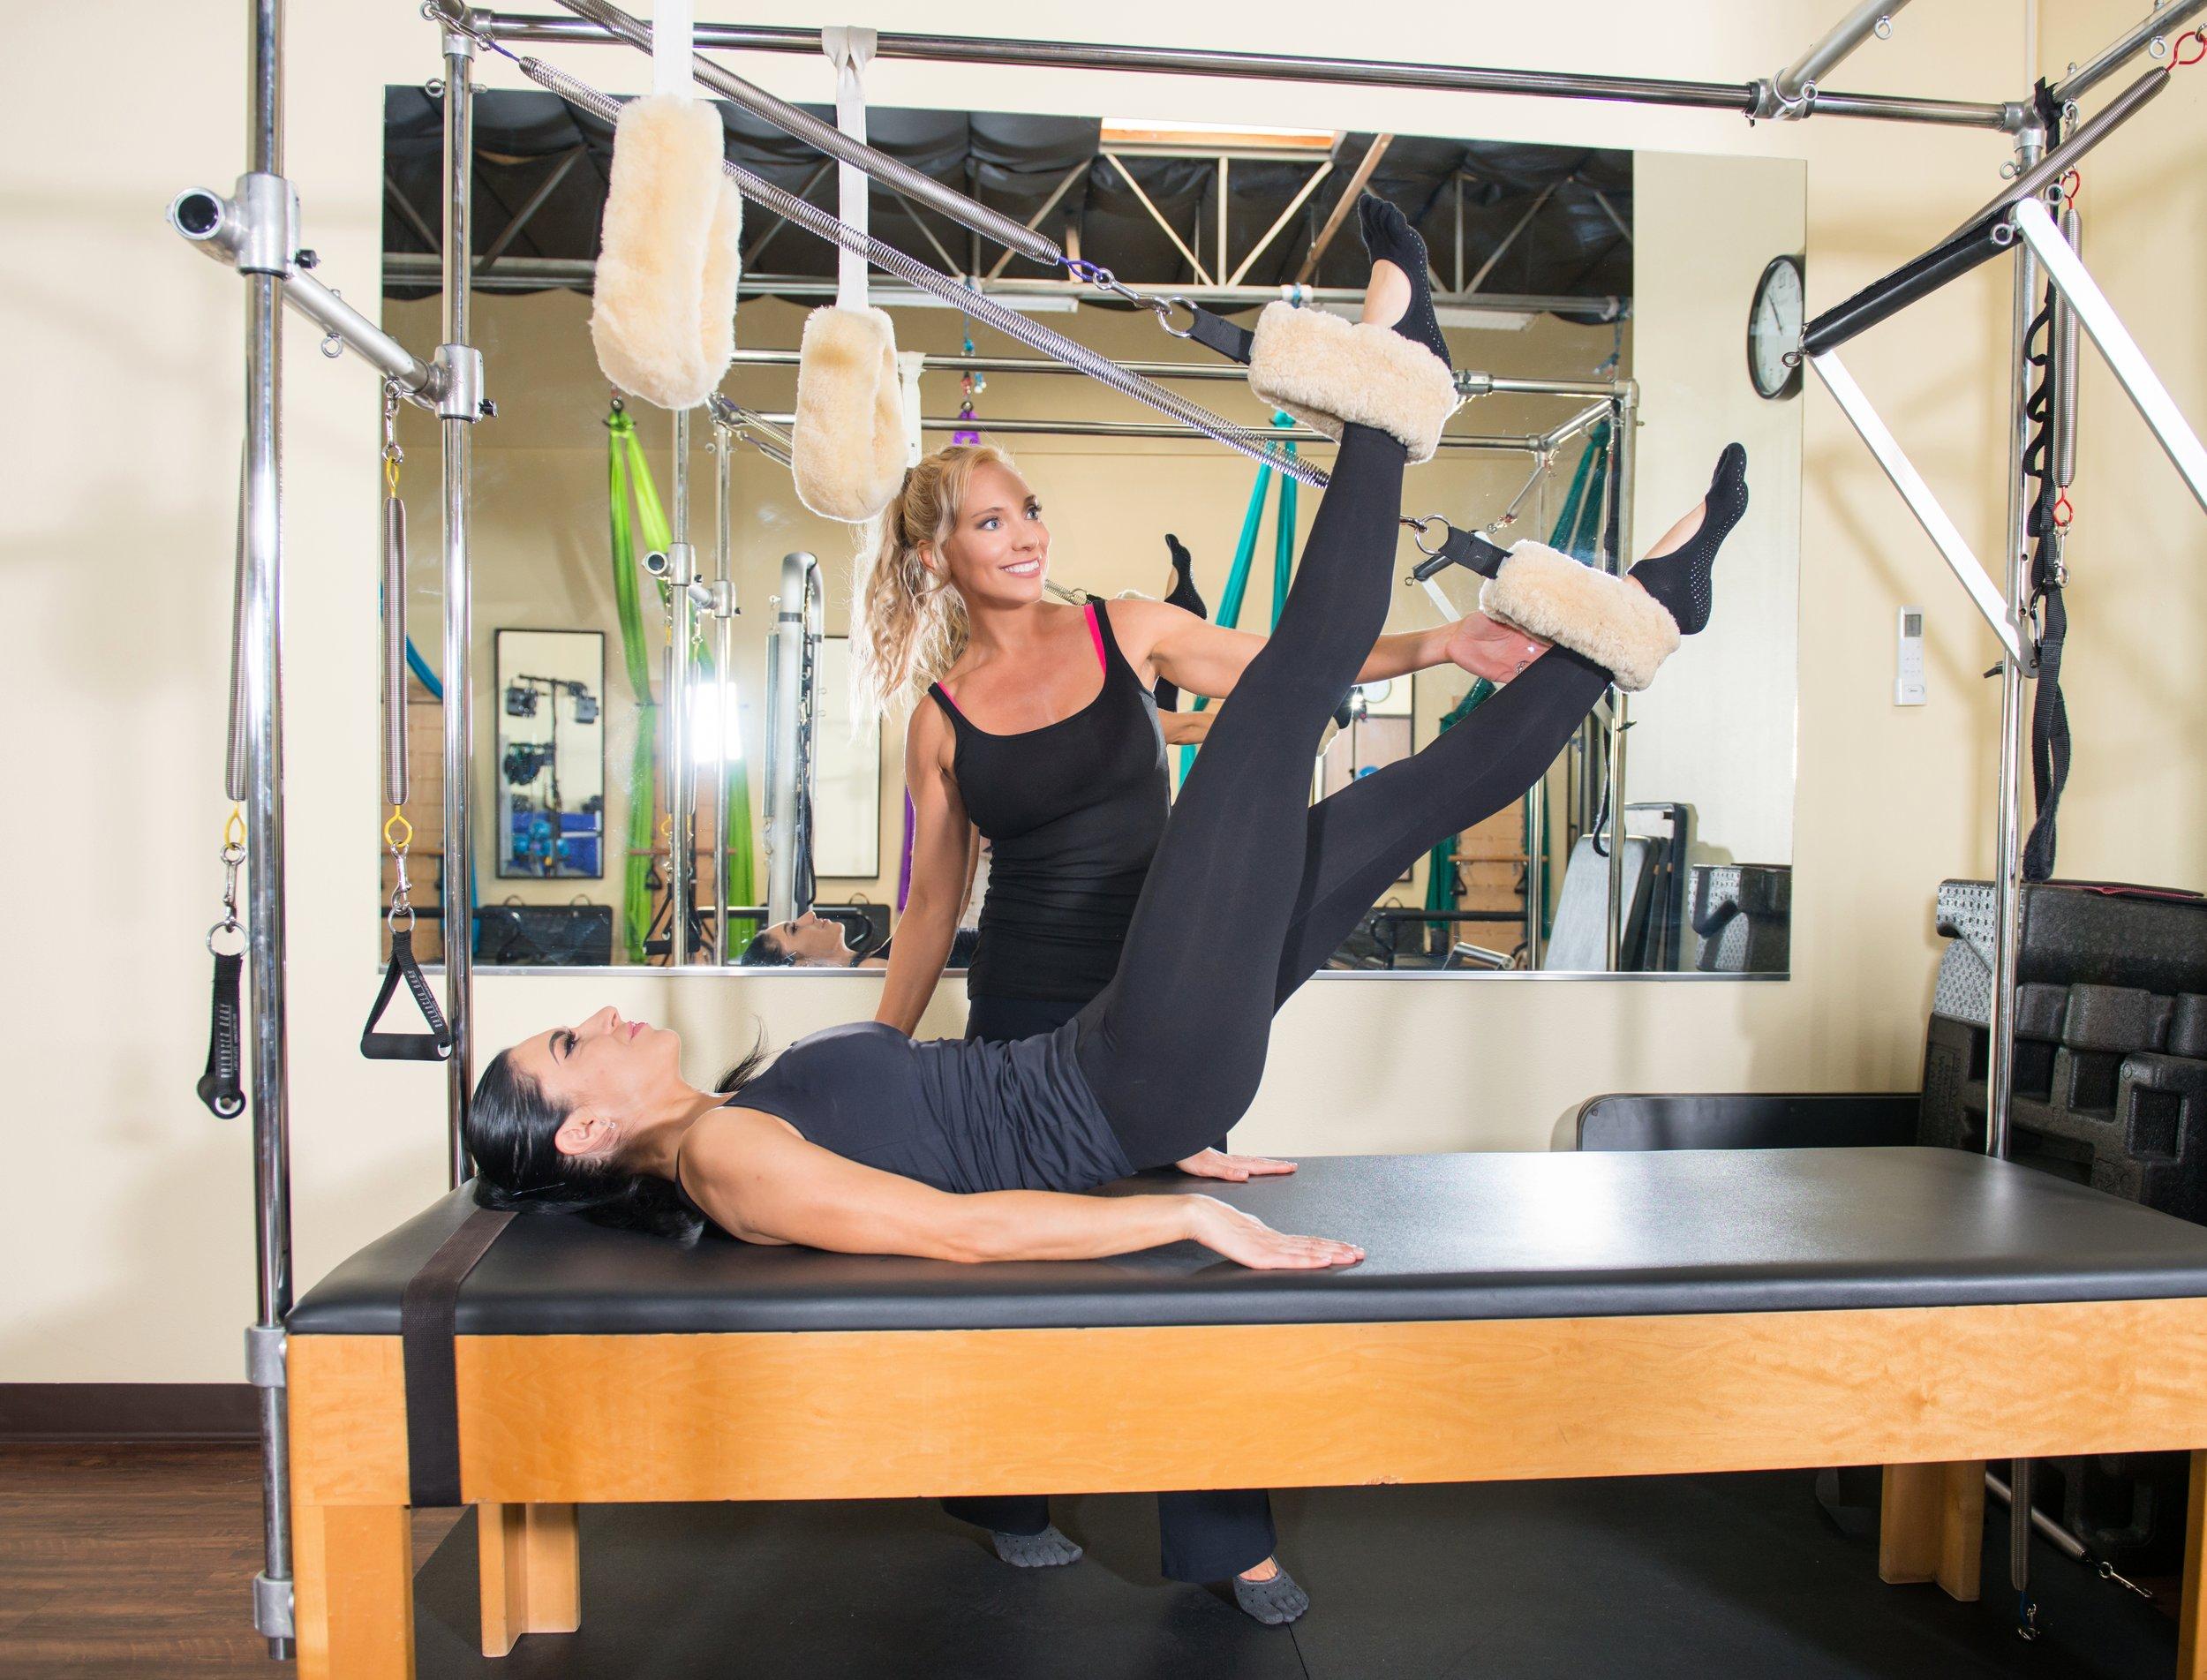 Pilates Privates, Pilates Rehabilitation, Back Pain Relief, Pilates of Eastlake Chula Vista